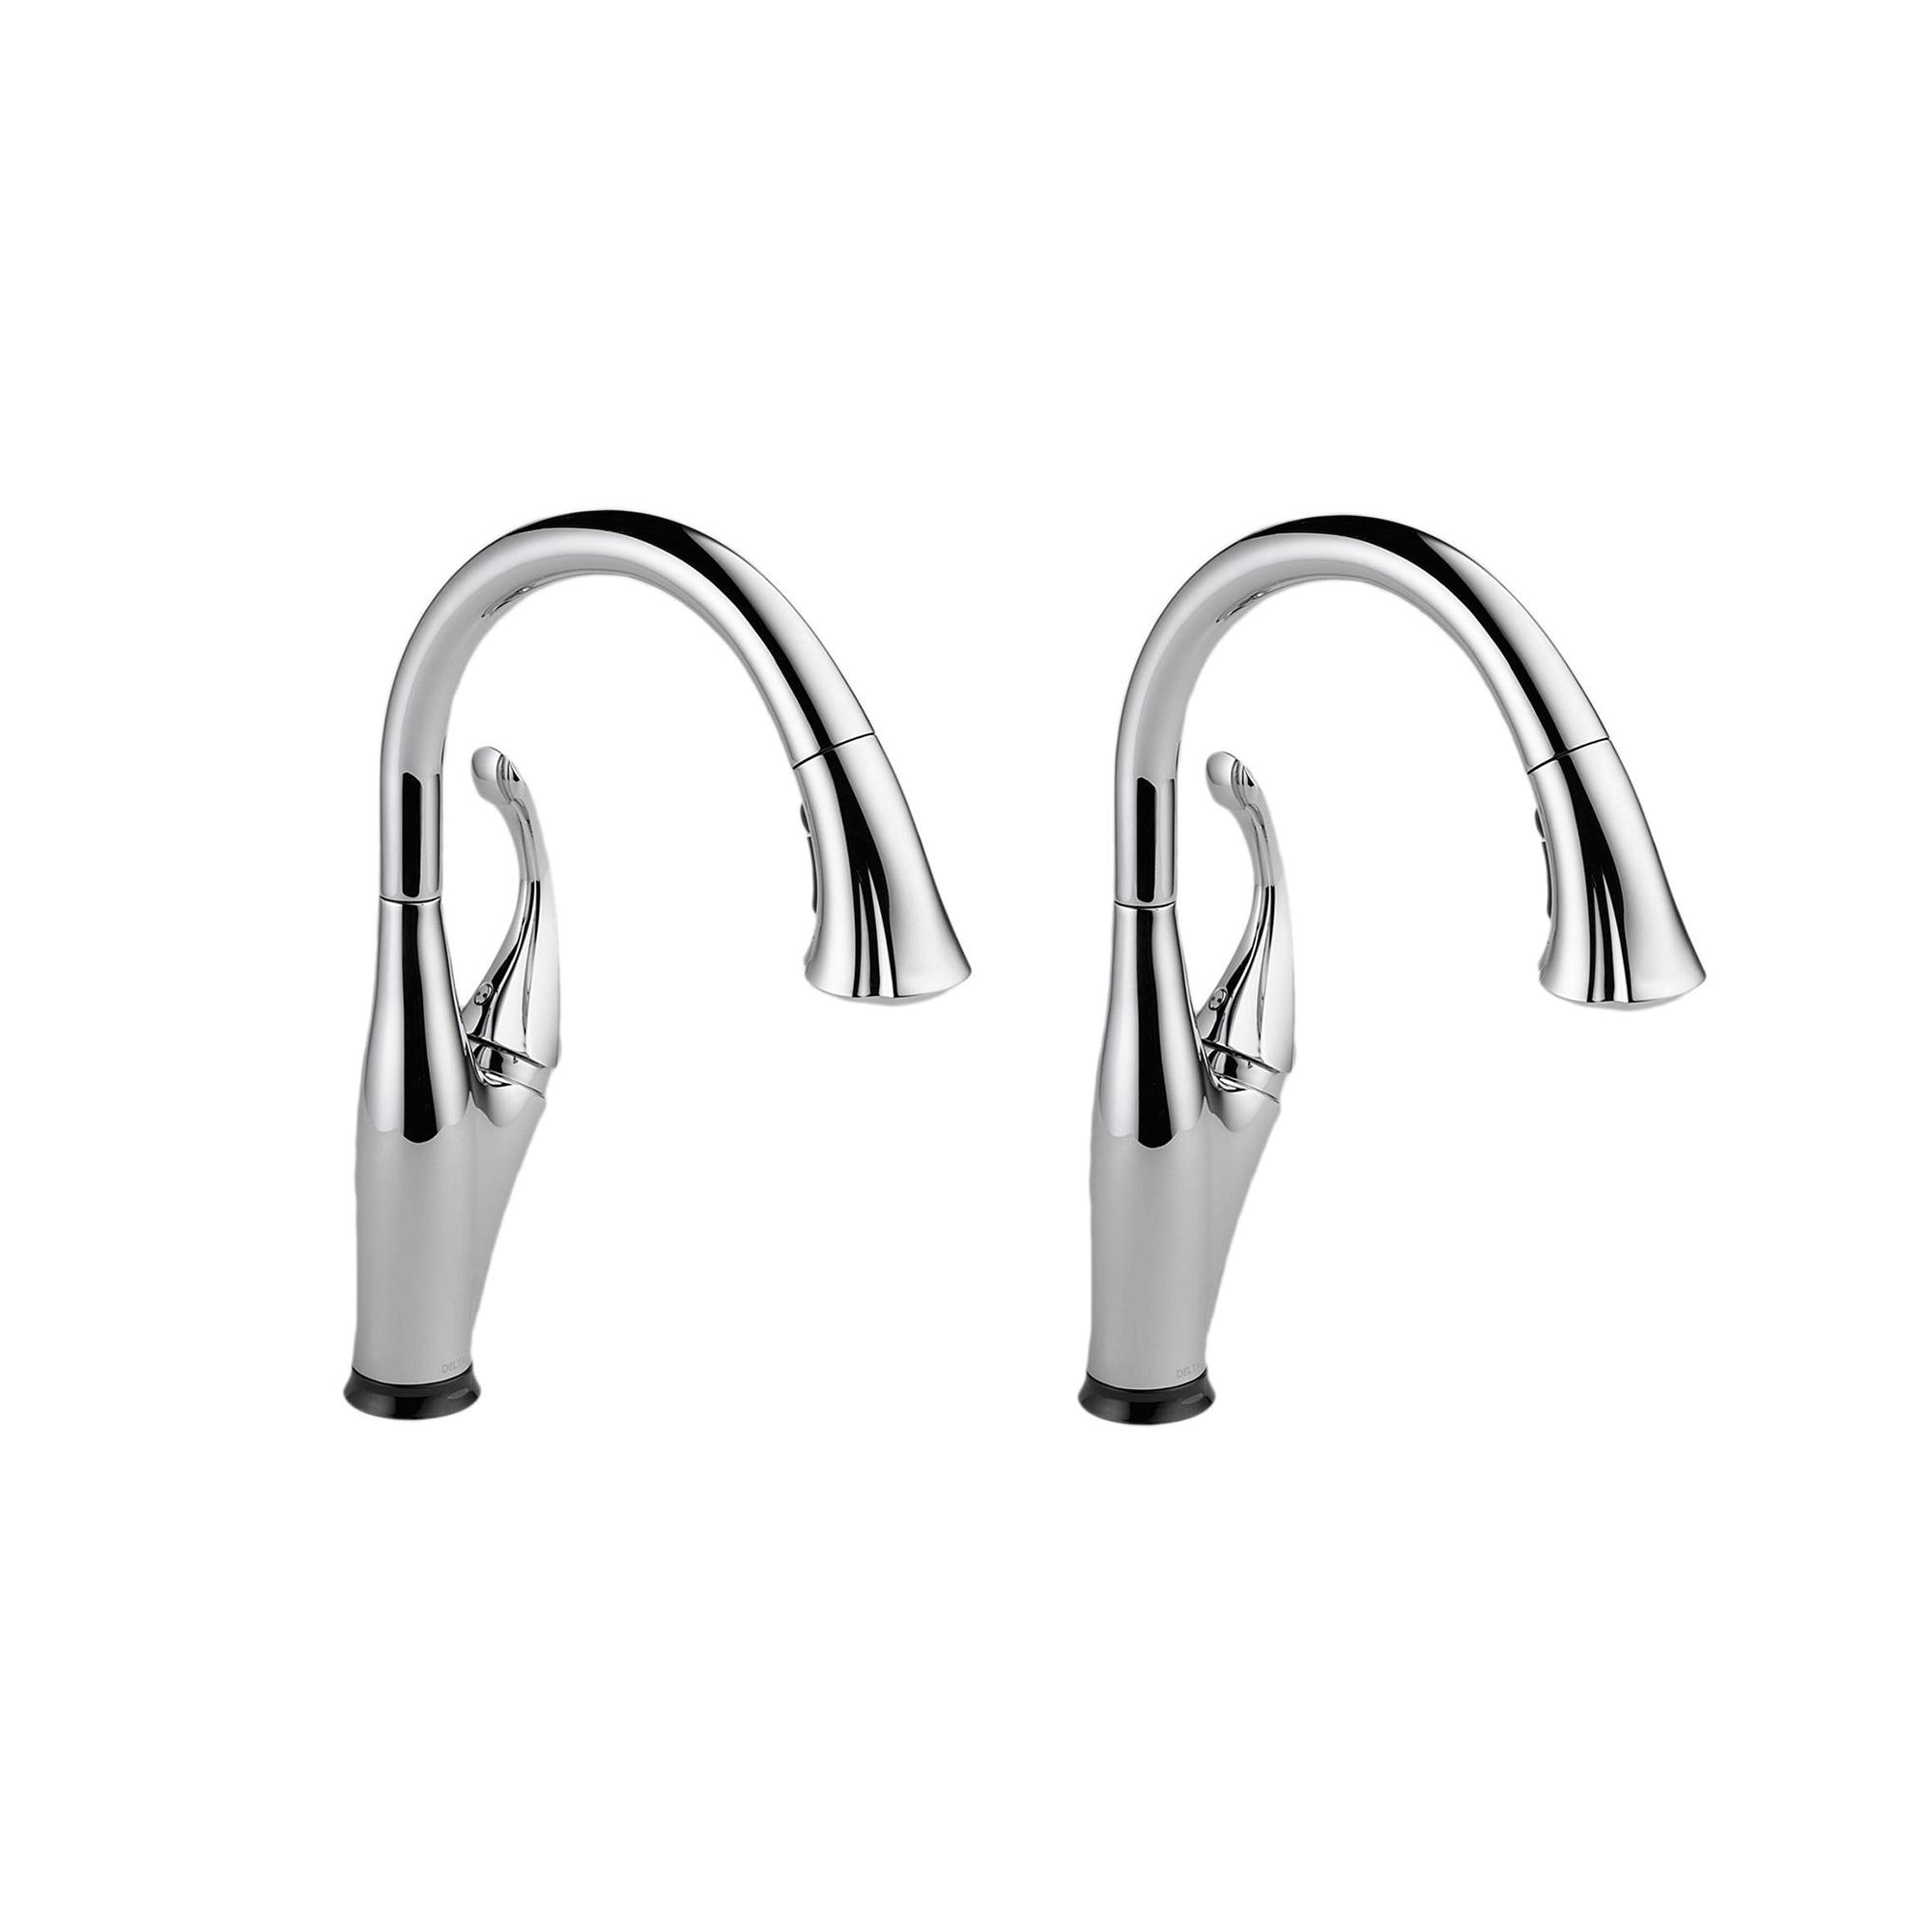 Details about Delta Addison Single Handle Touch-Activated Kitchen Faucet,  Chrome (2 Pack)